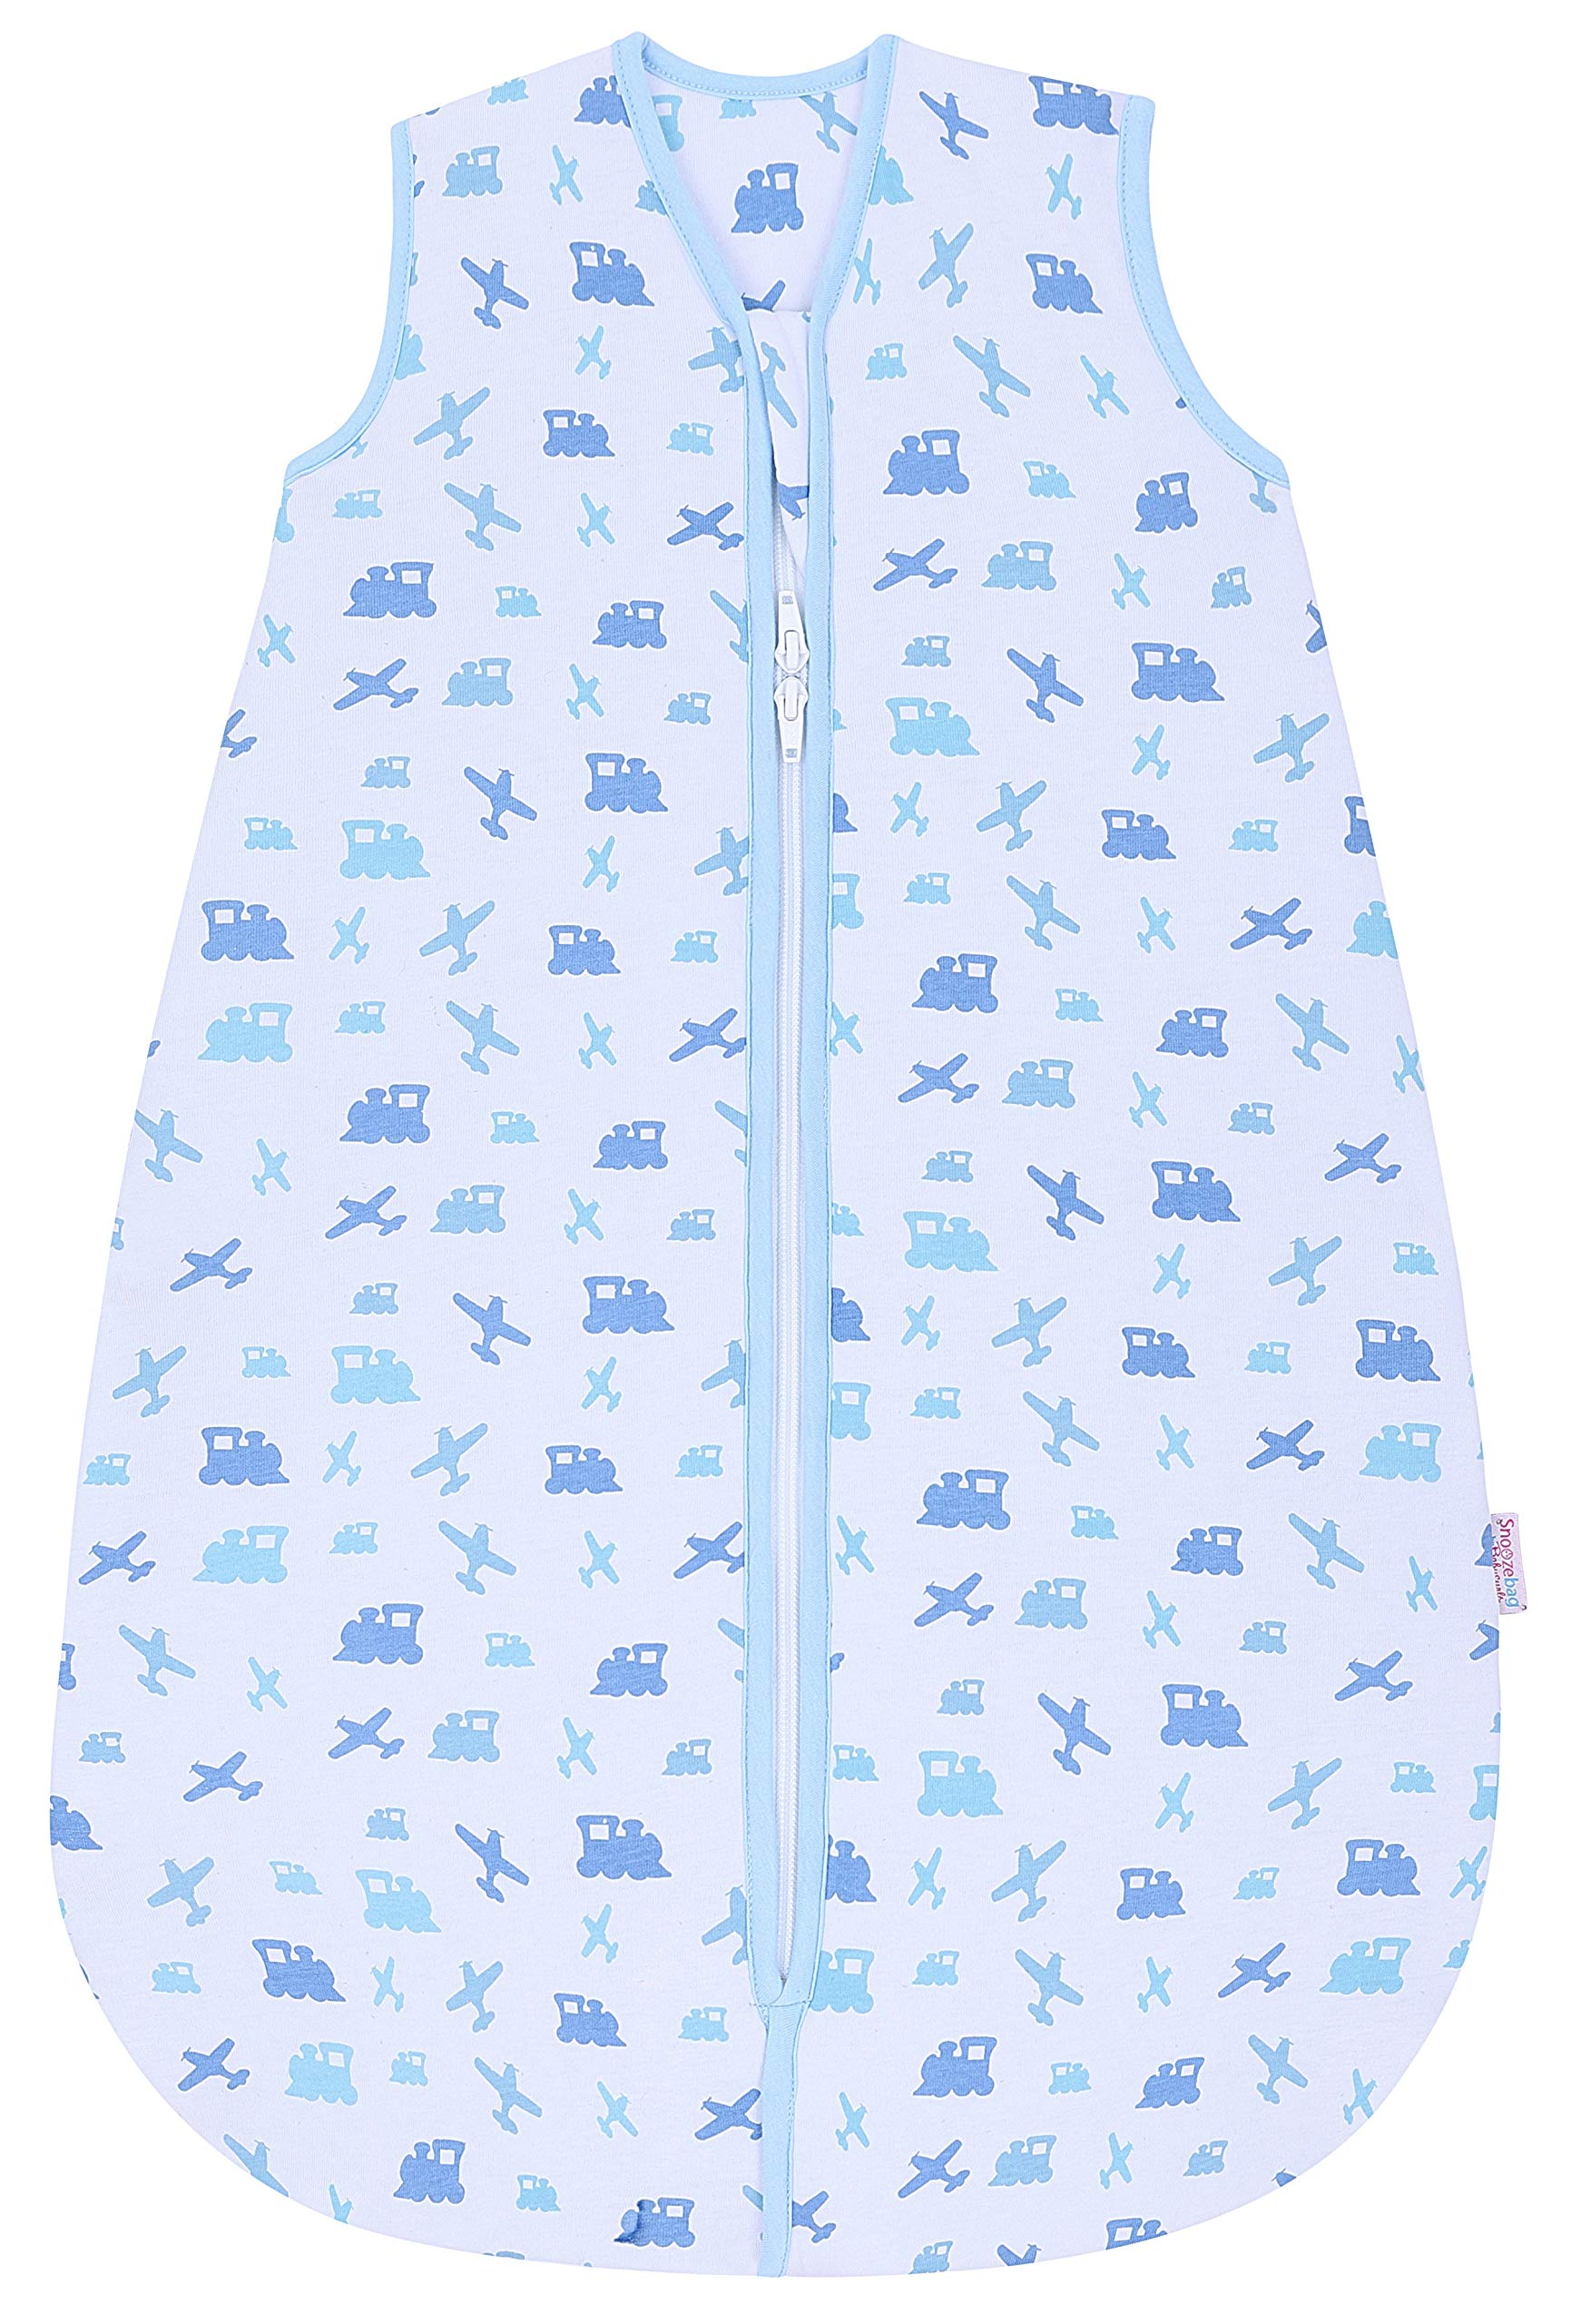 Snoozebag – Saco de dormir para bebé (100% algodón, 2,5 Tog), color azul azul azul Talla:3-6 años